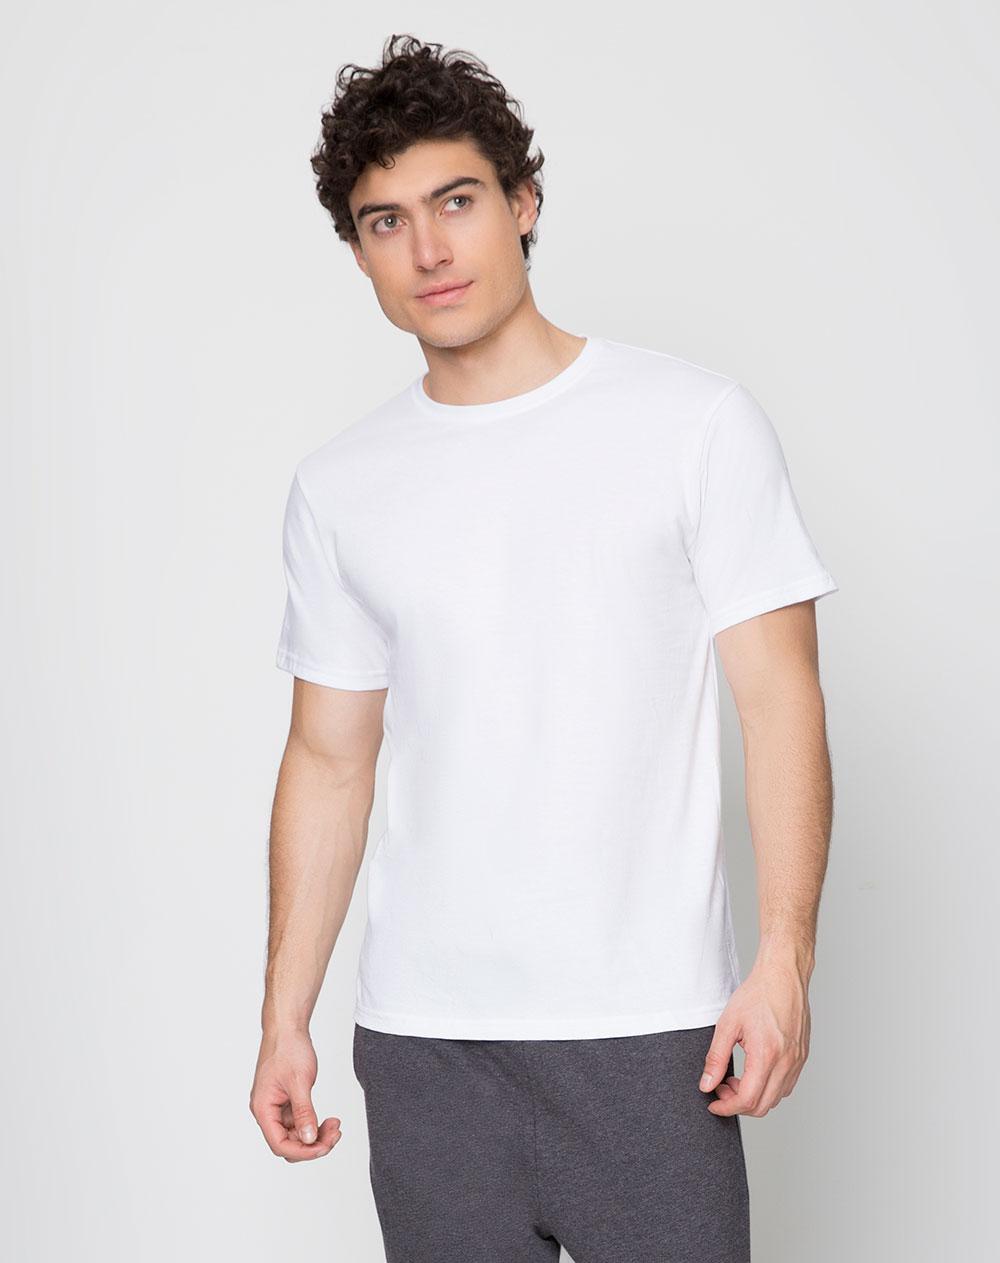 D o de camisetas de hombre verdi blanco s de manga corta for Ropa interior punto blanco